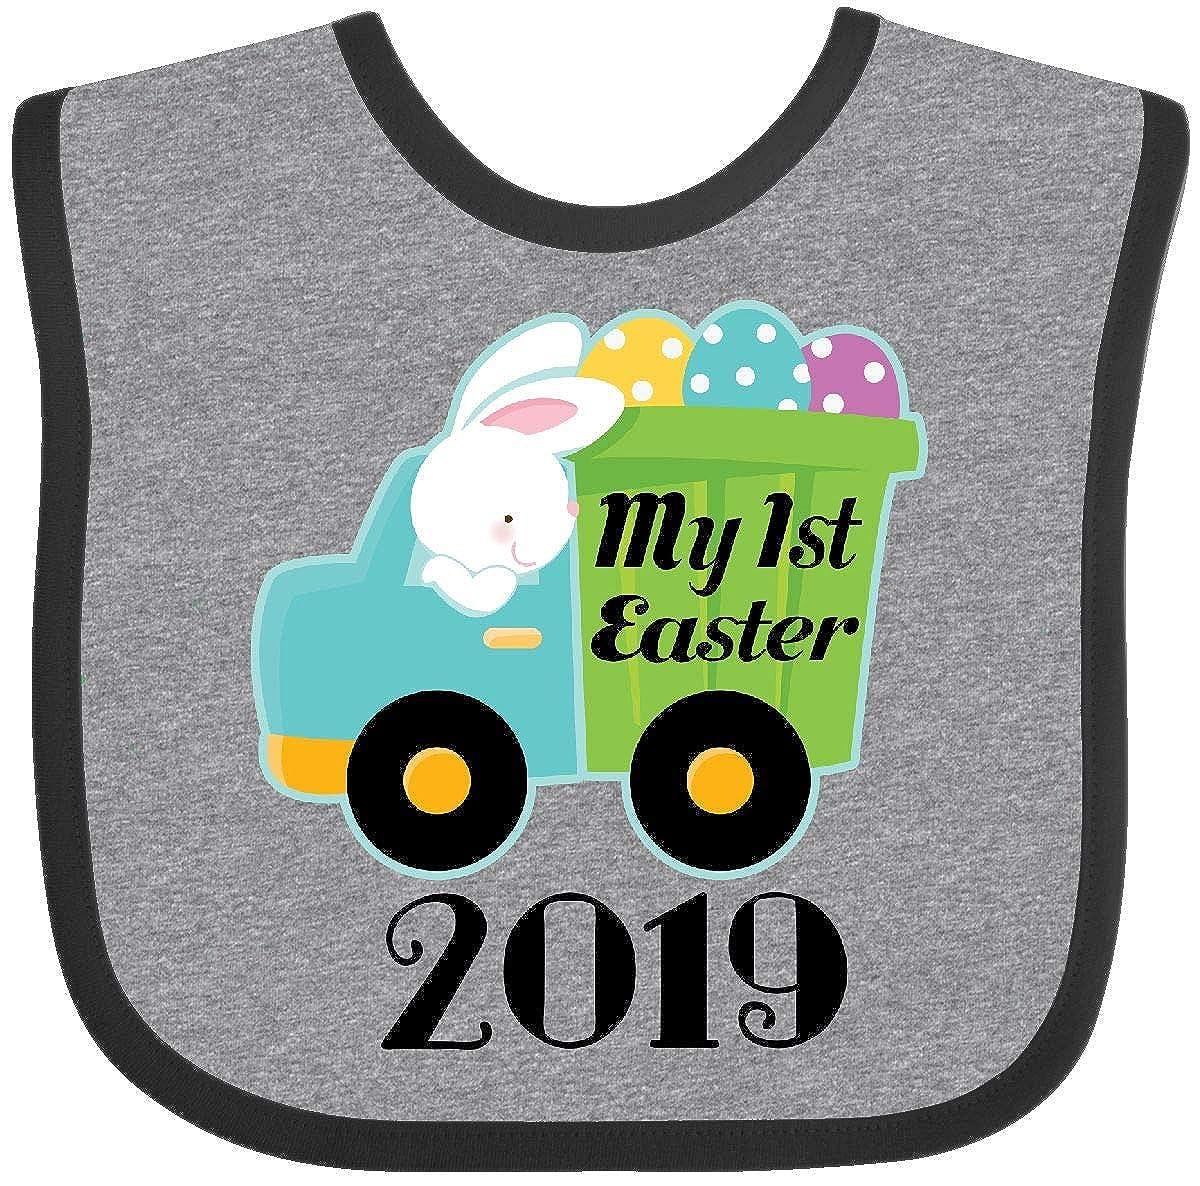 Inktastic - My 1st Easter 2019 Bunny Egg Truck Baby Bib 2e948 14-190792-116-887-2987